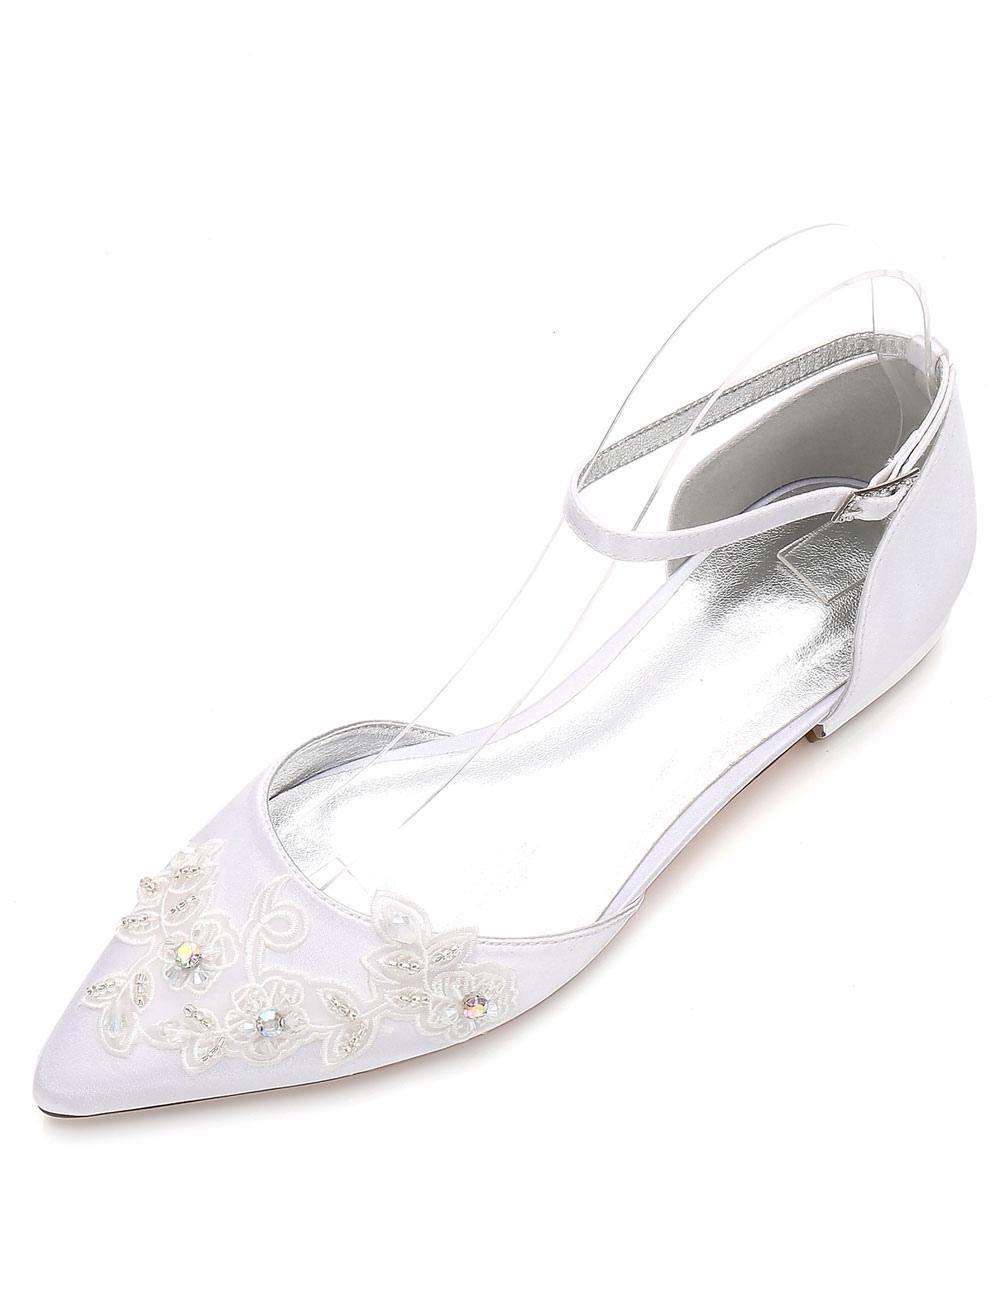 791ec7d117e White Wedding Shoes Pointed Toe Flat Lace Ankle Strap Bridal Shoes ...